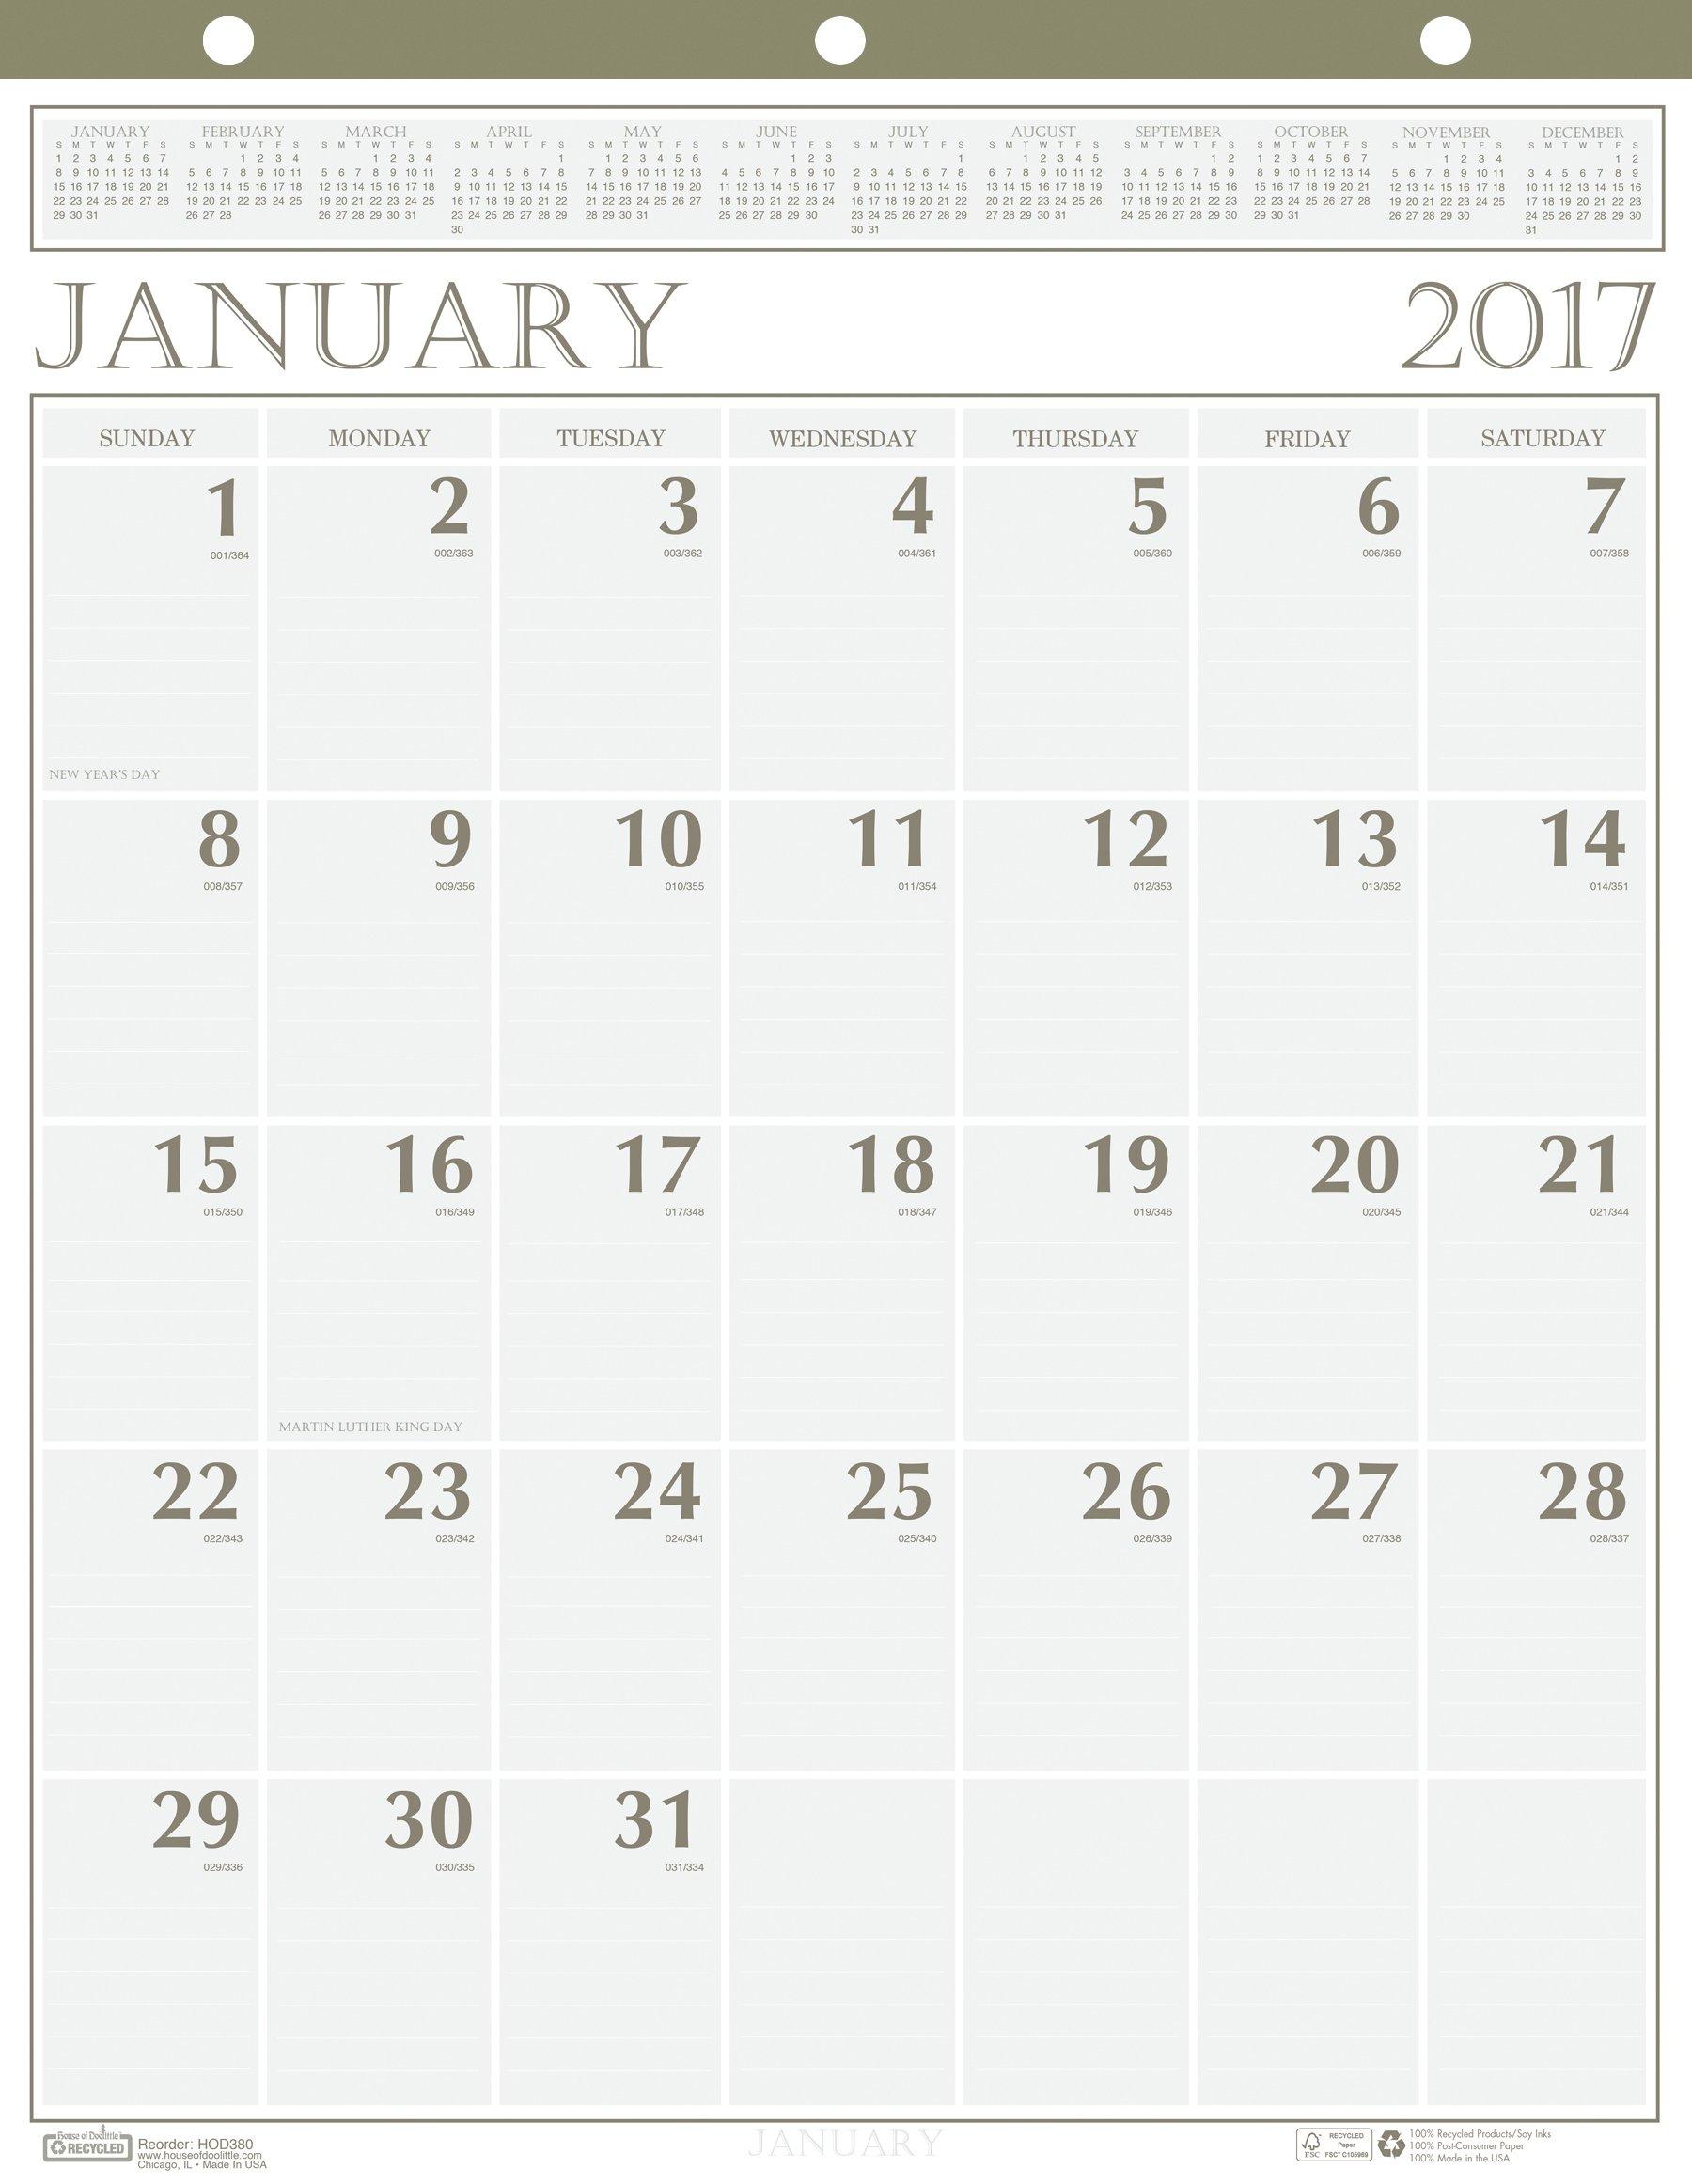 Casa de Doolittle 2017 mensual calendario de pared, Classic, 20 x 26